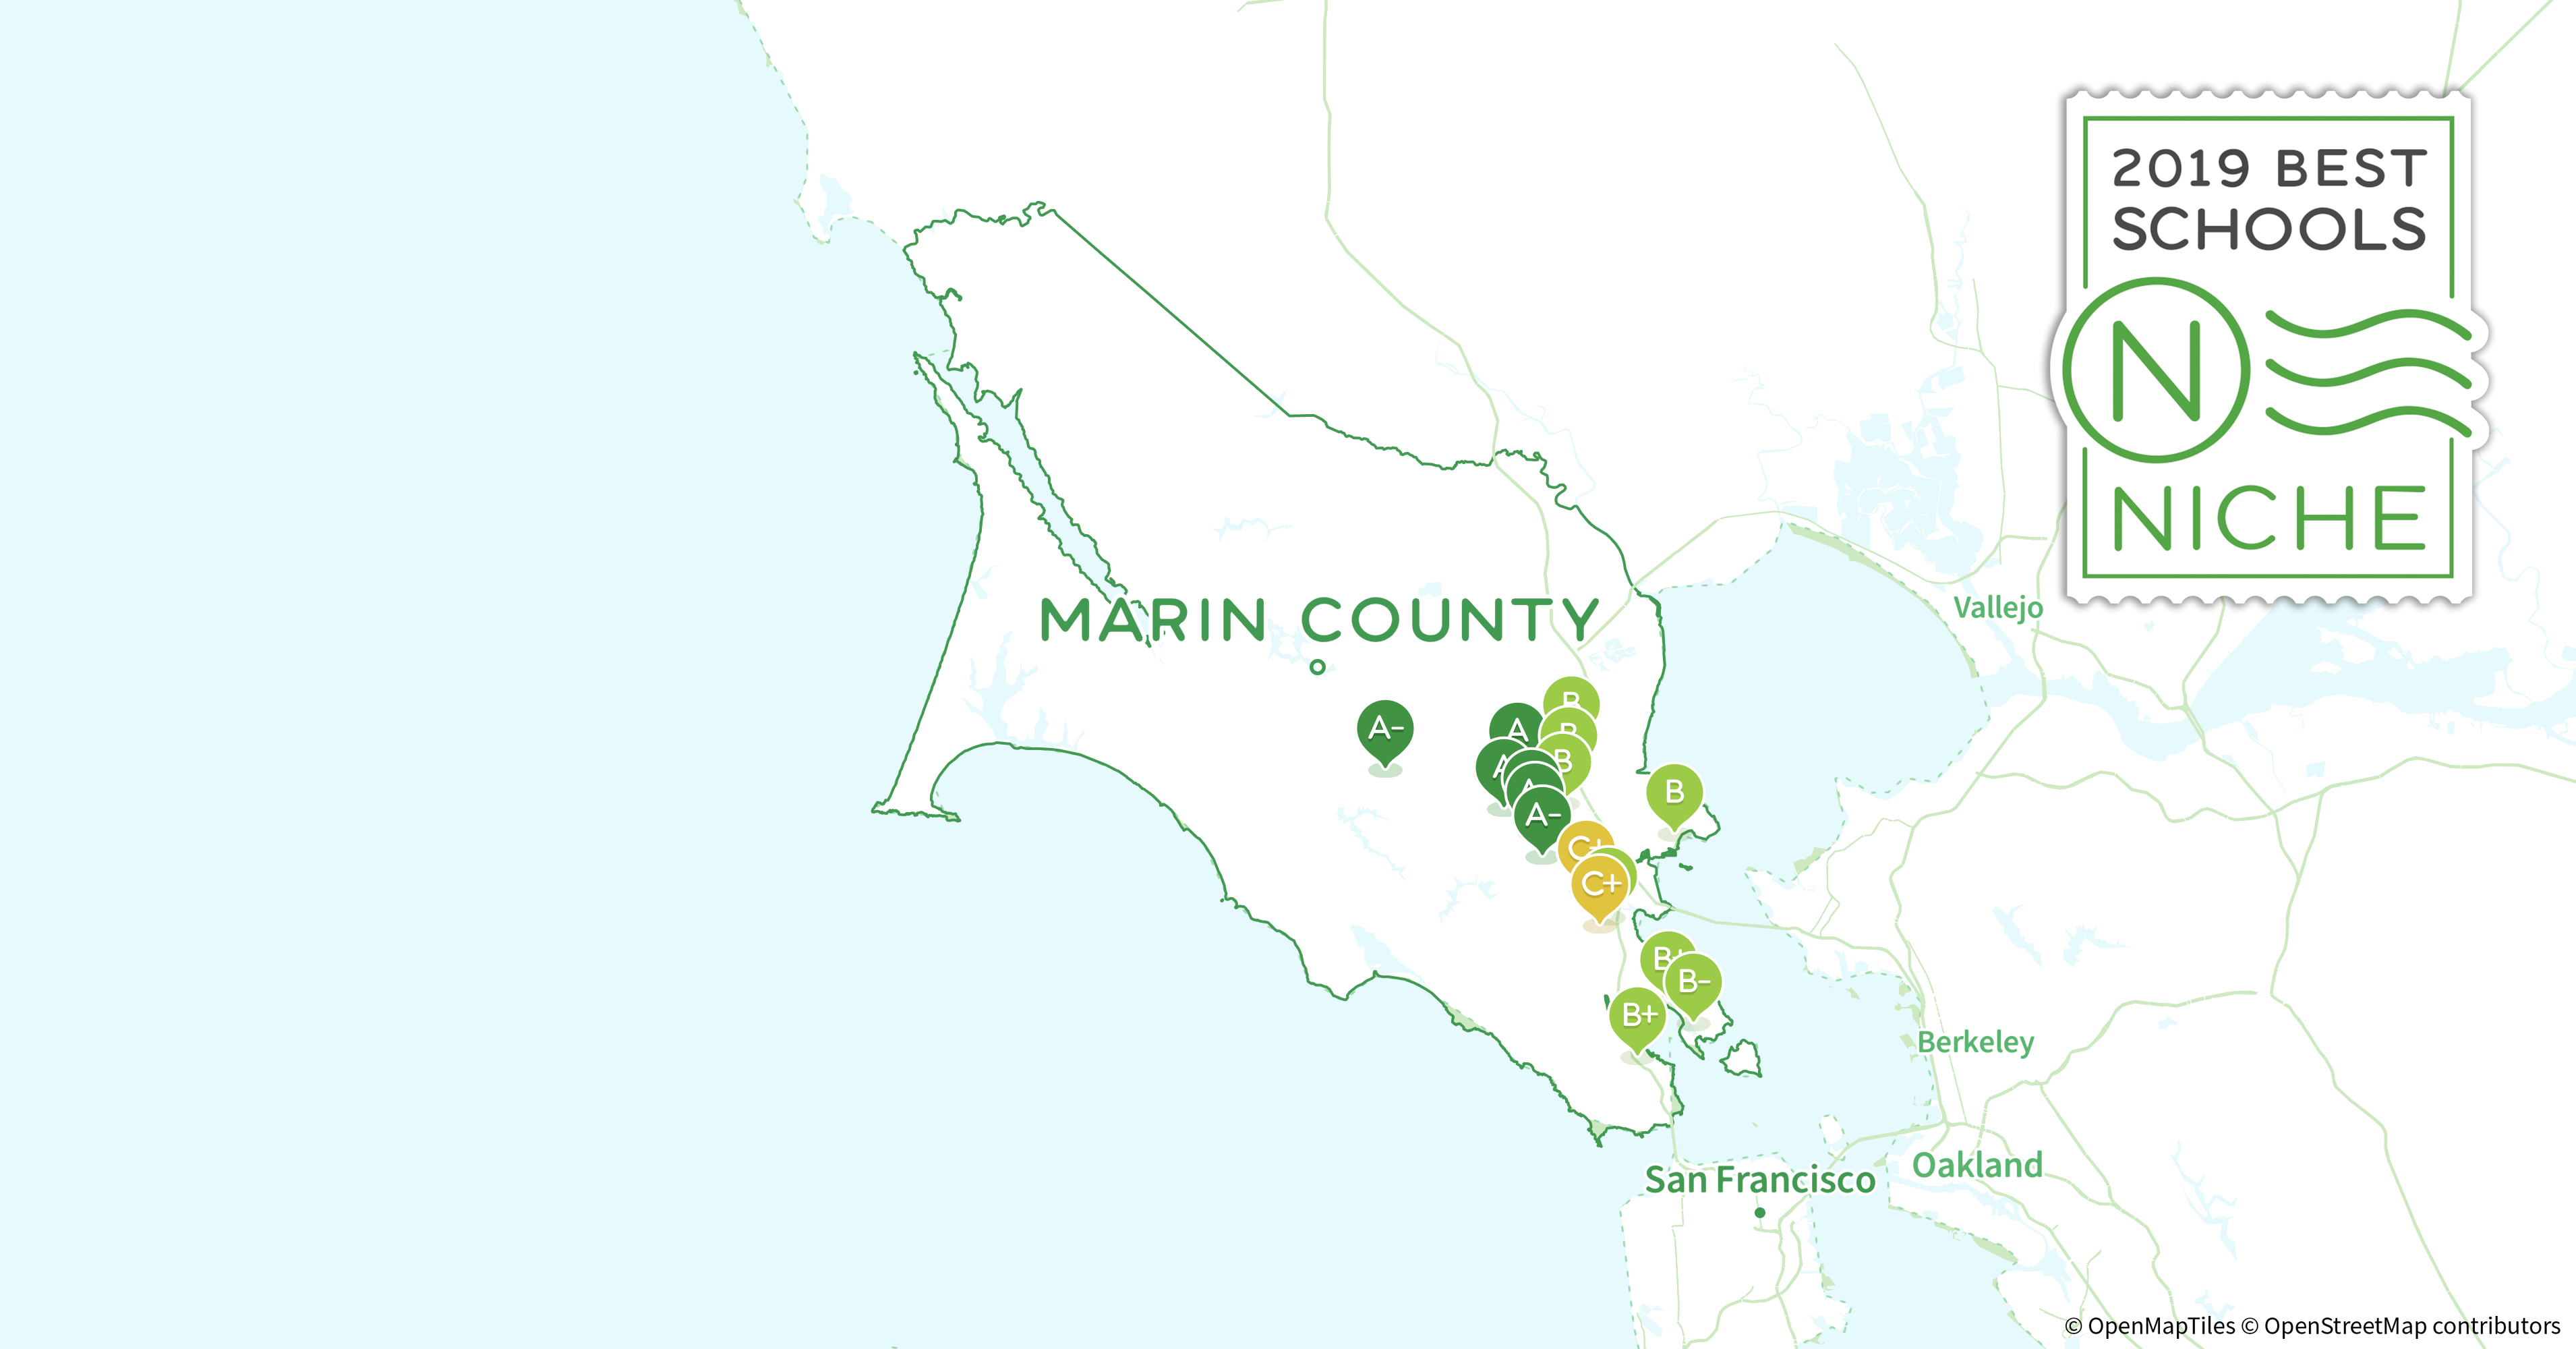 School Districts In Marin County, Ca - Niche - California School District Rankings Map